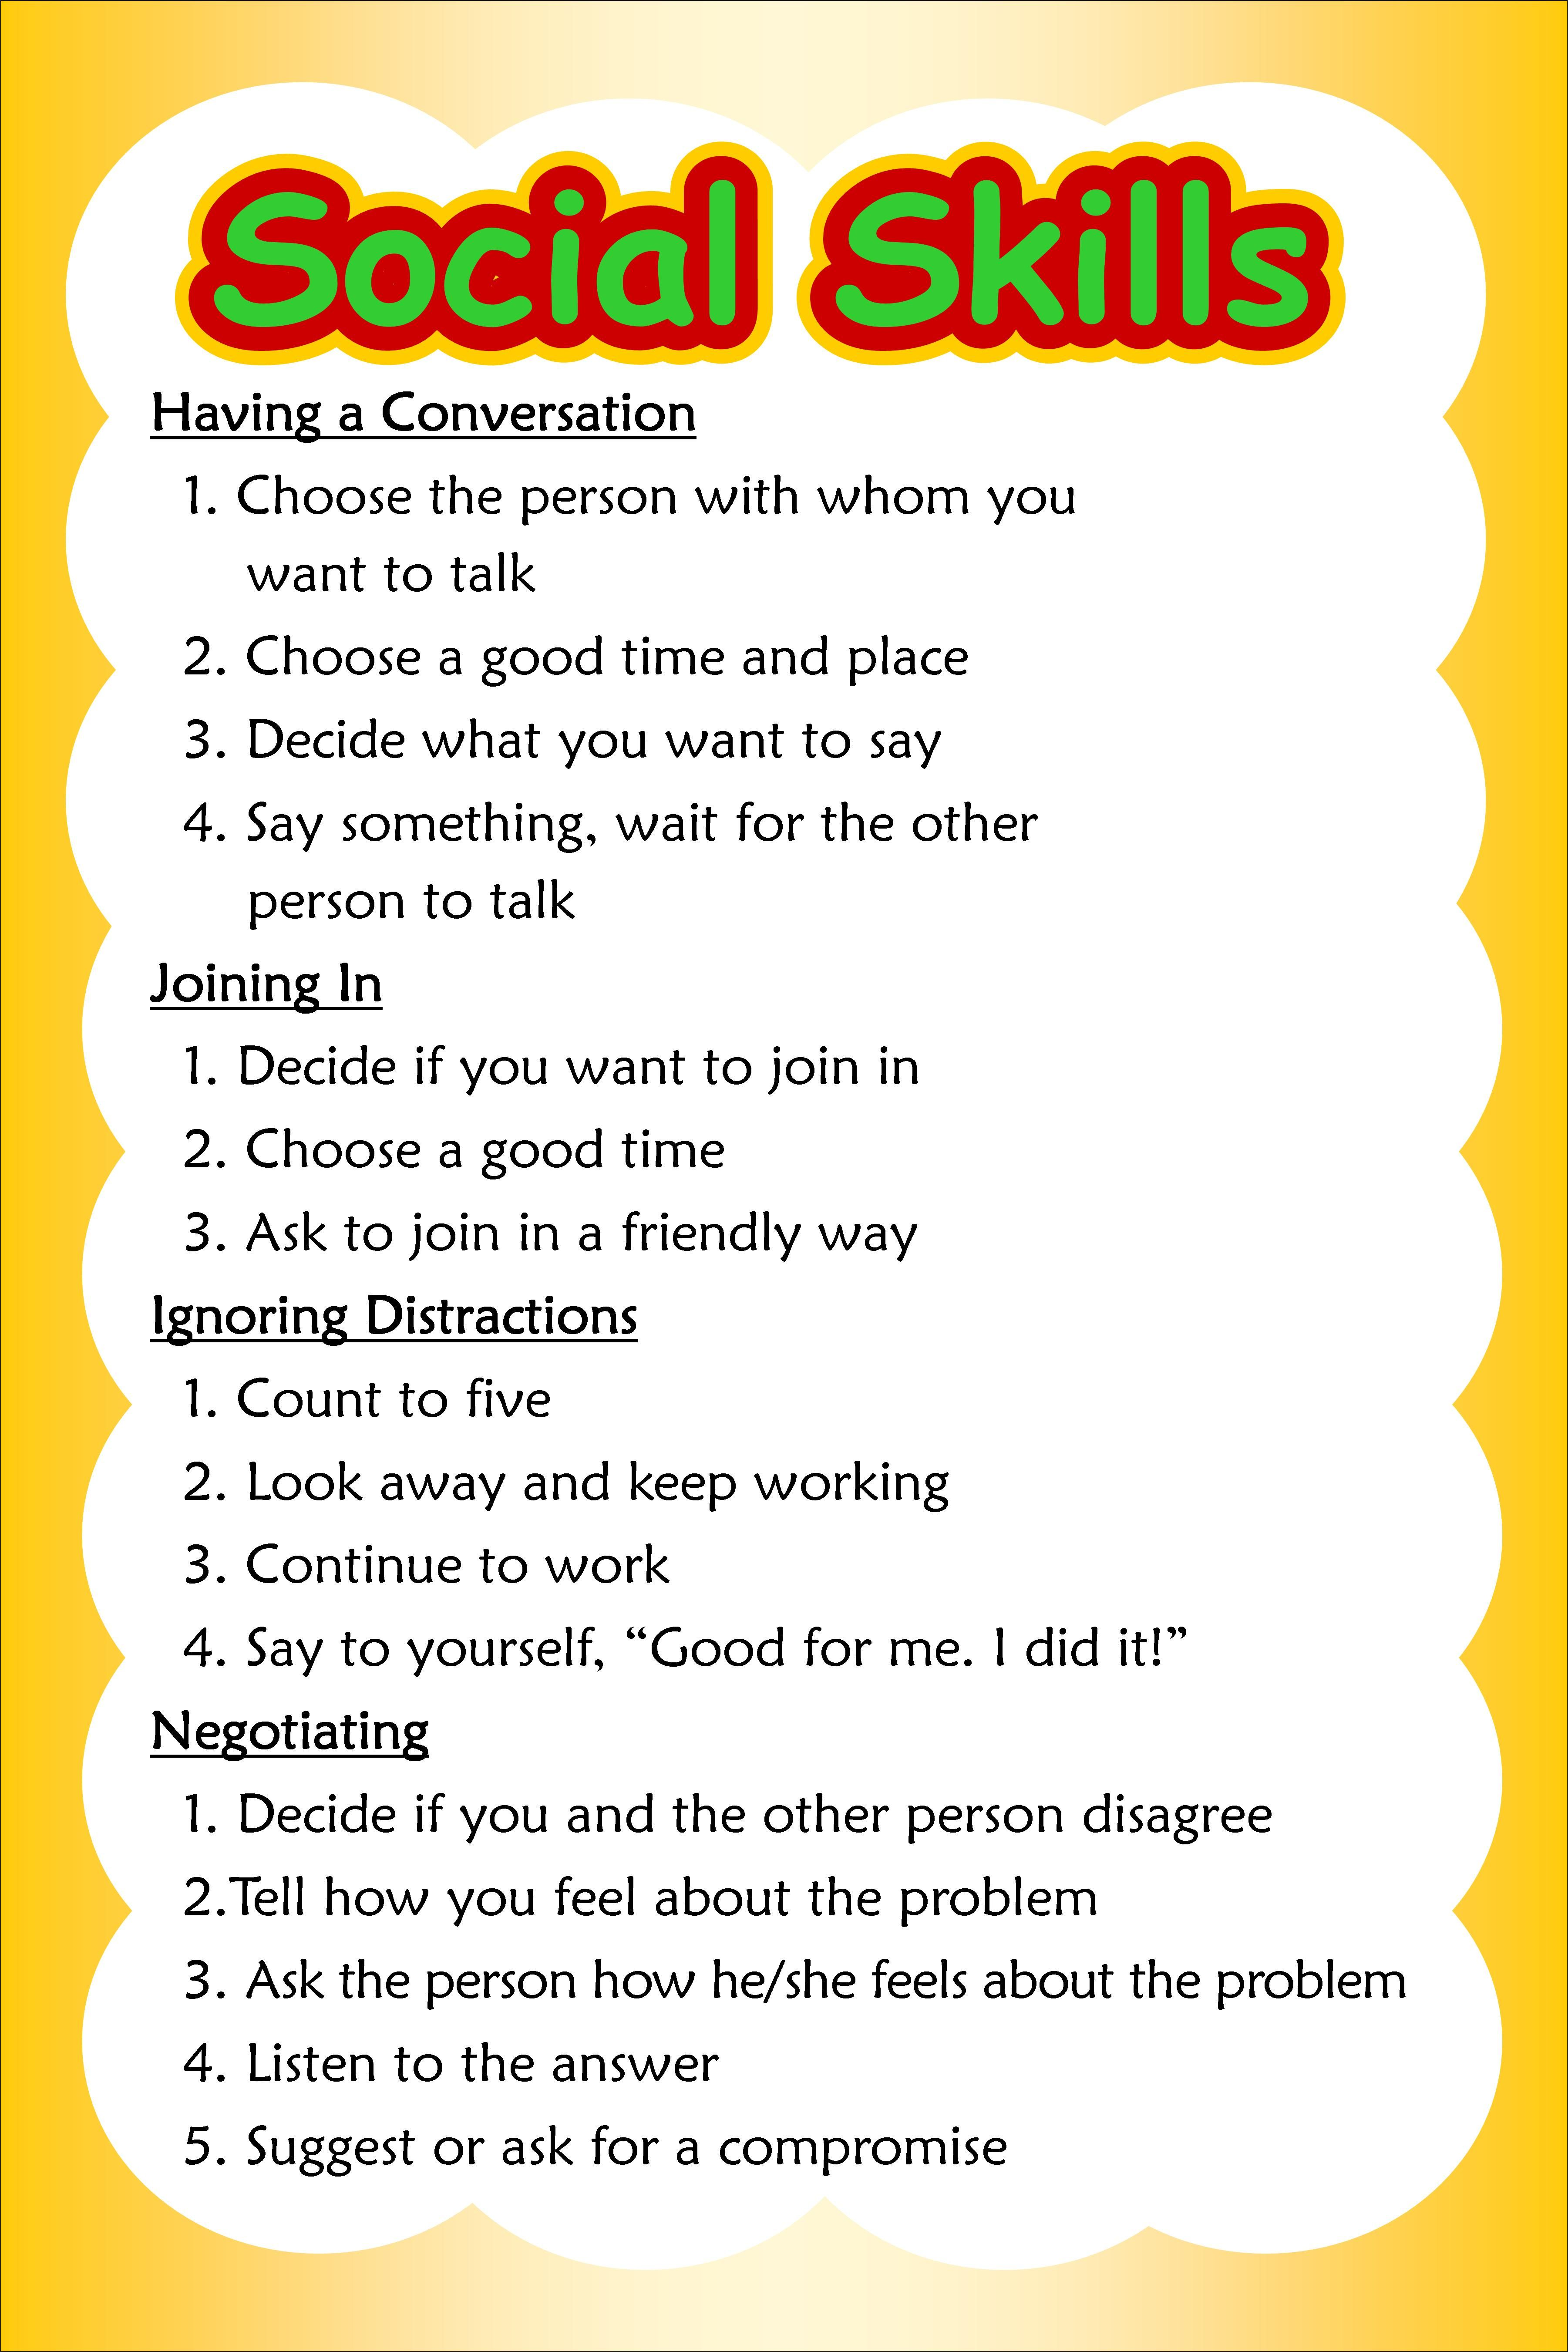 Social Skills Poster 3 Of 3